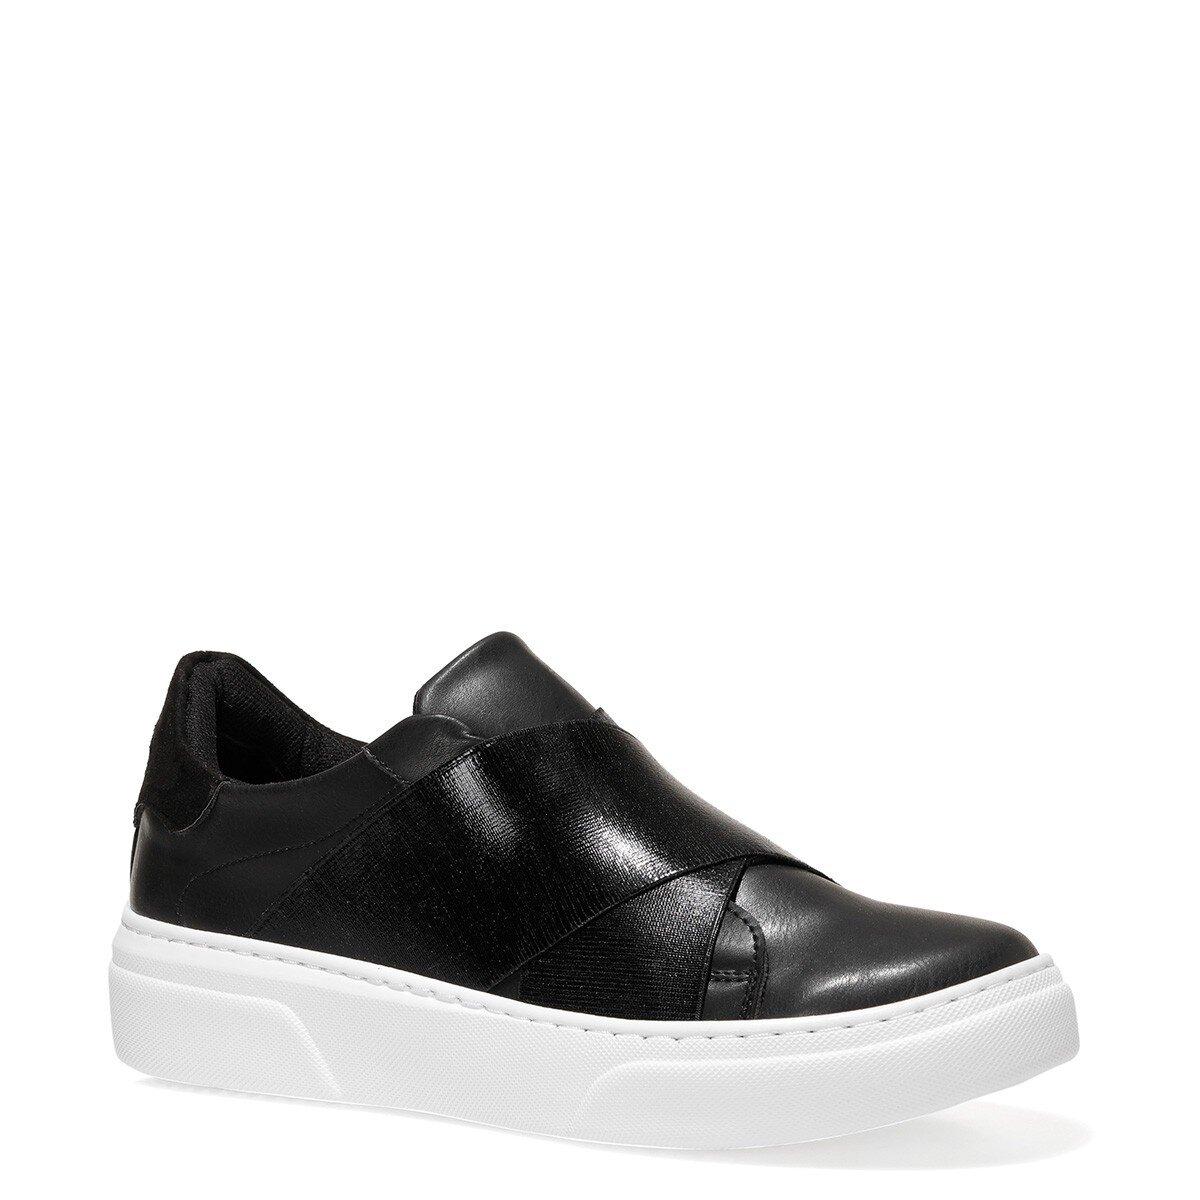 GOPCHA 1FX Siyah Kadın Sneaker